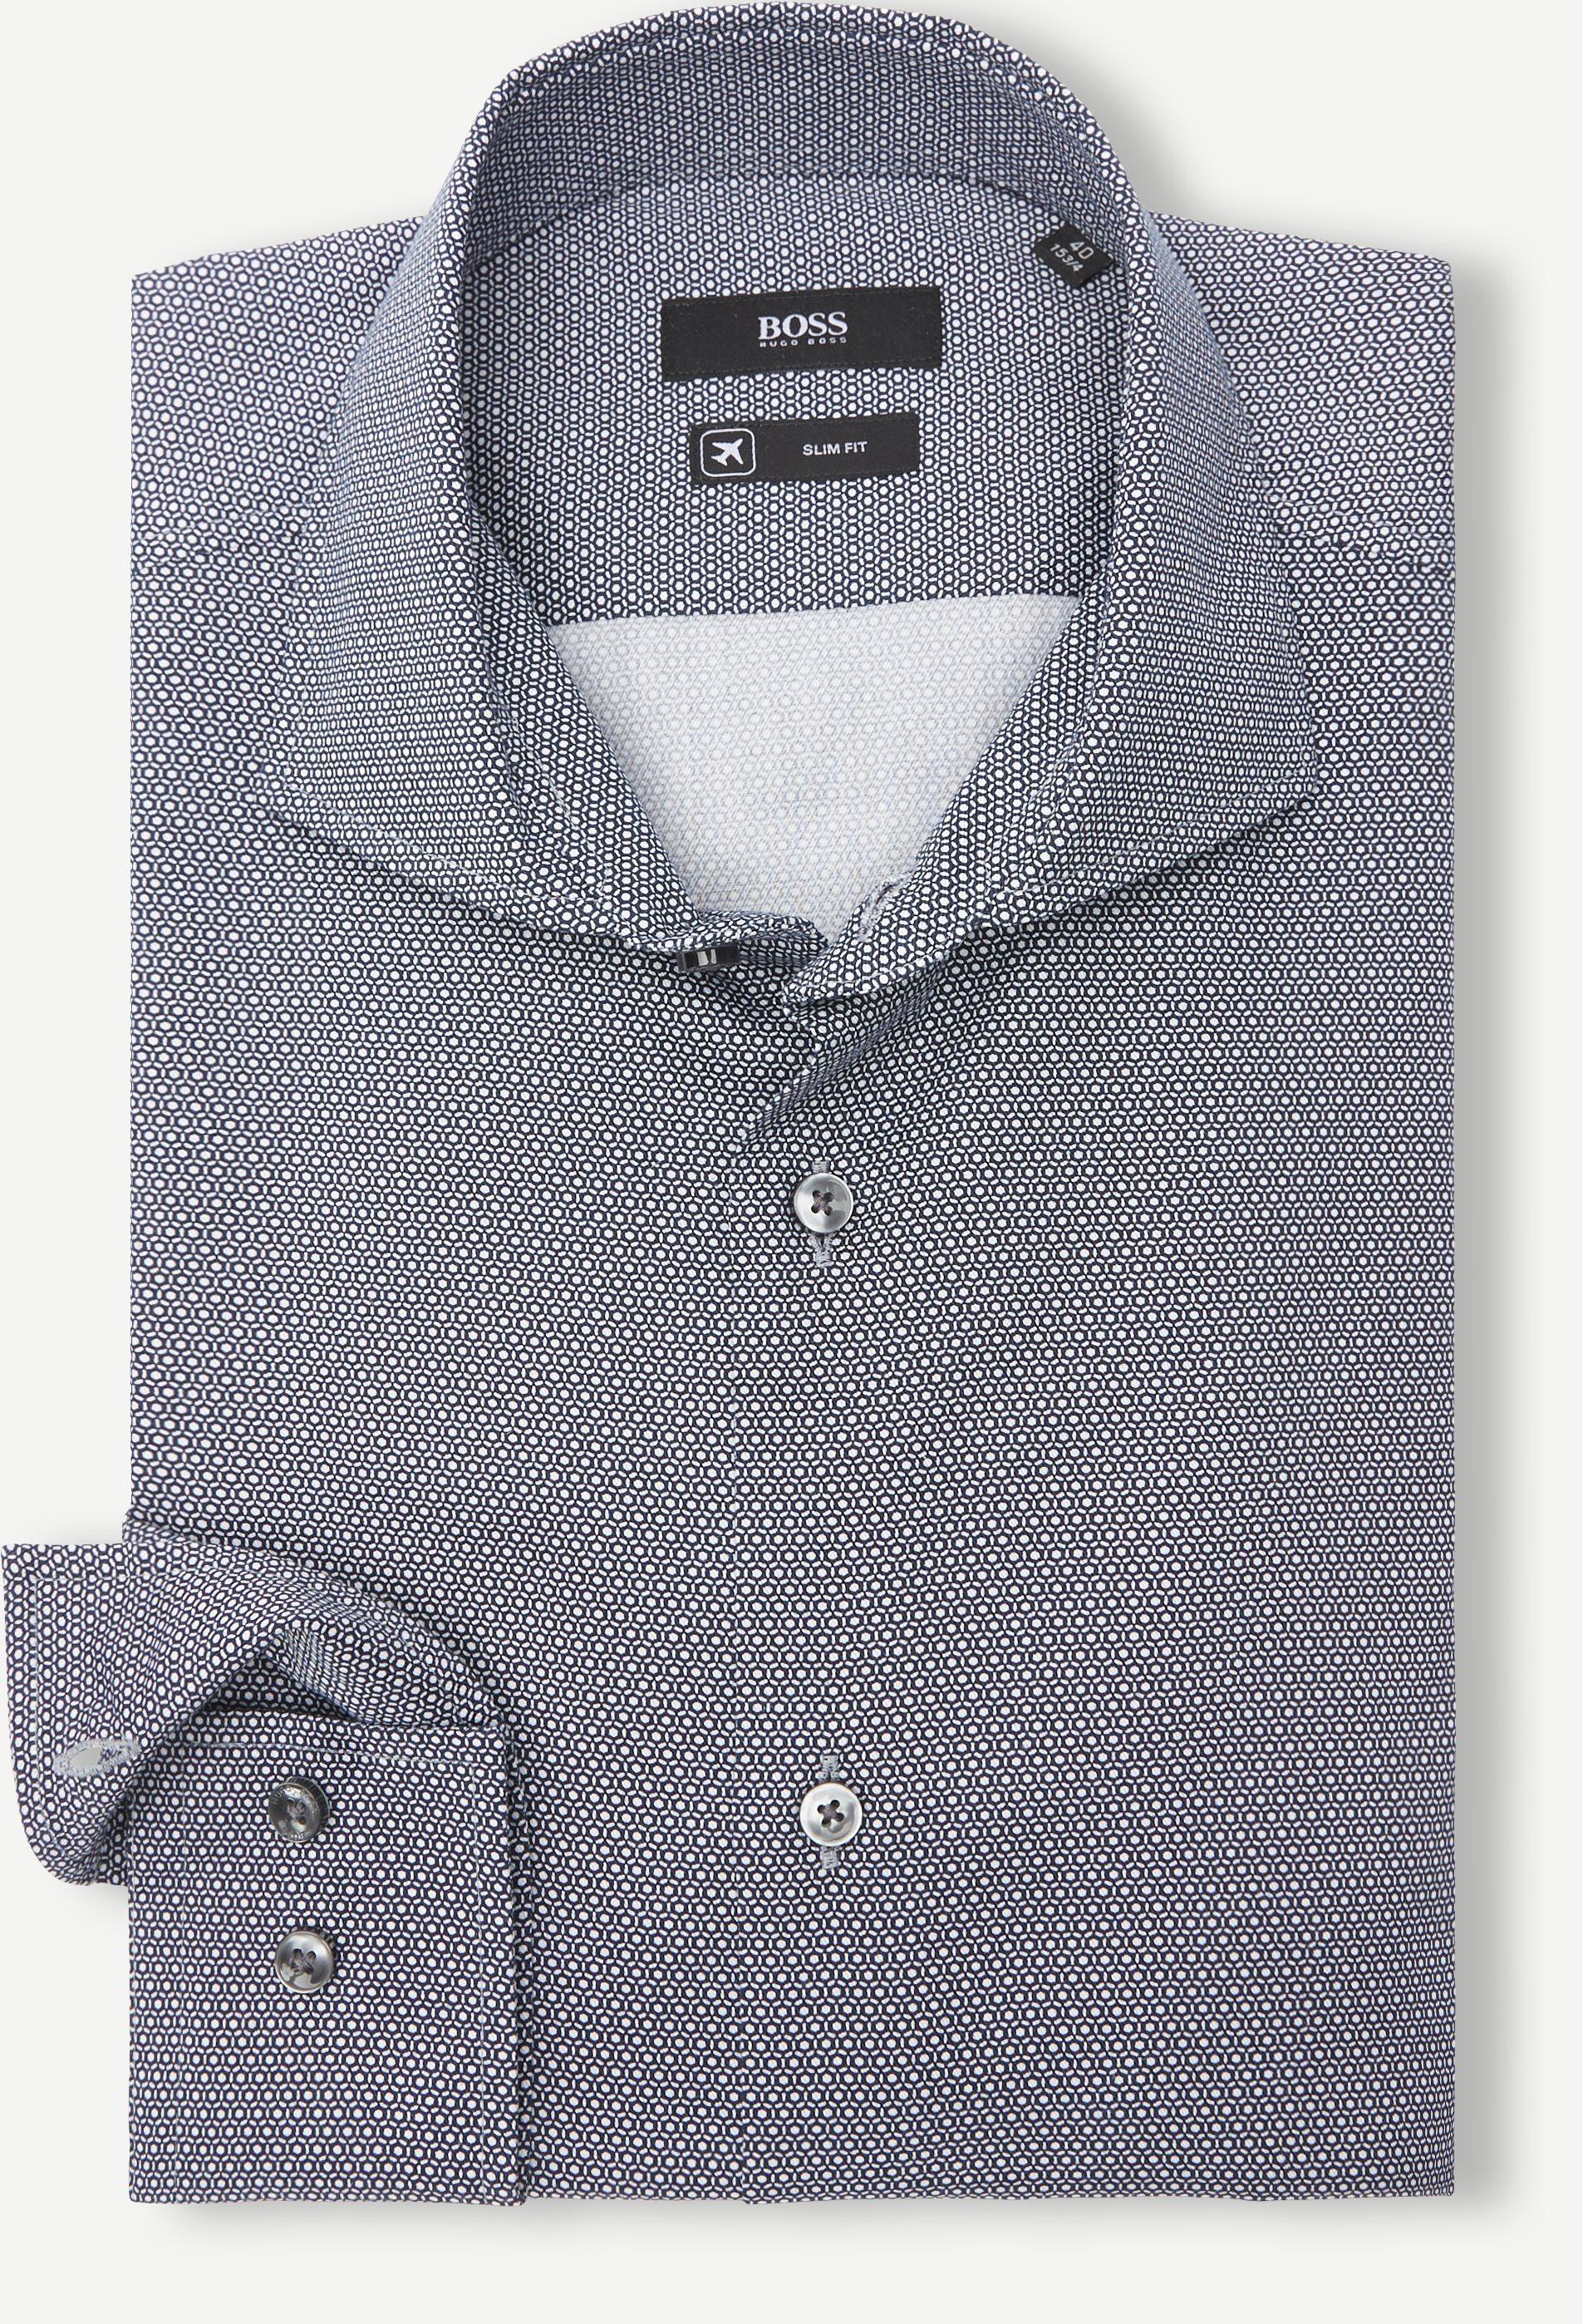 Hemden - Slim fit - Blau